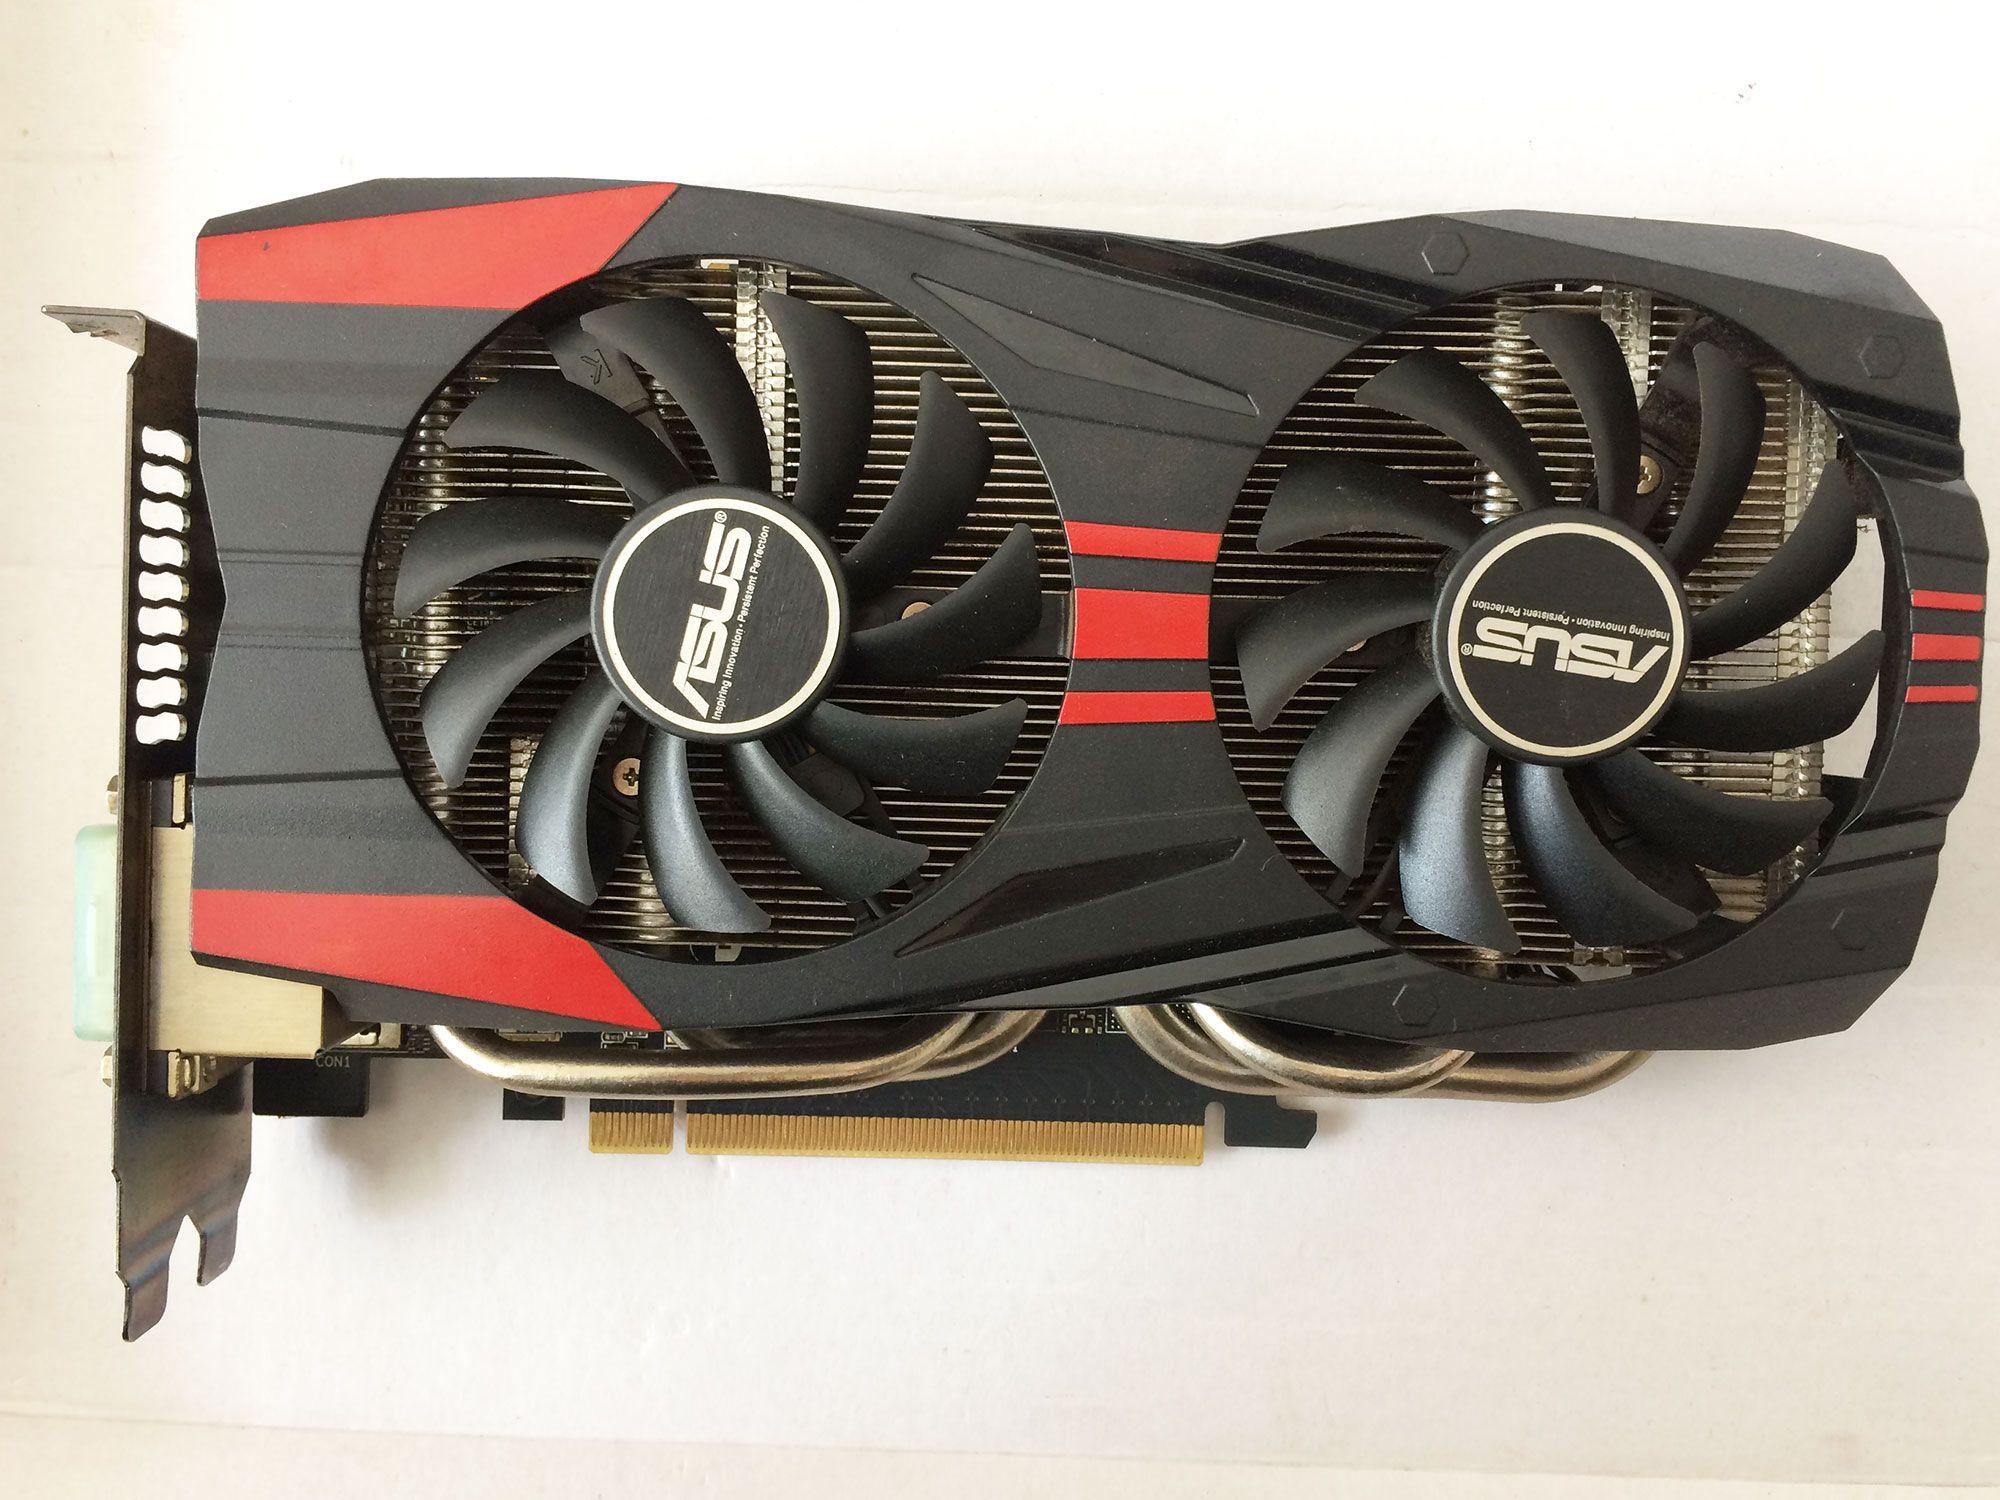 Asus Nvidia Geforce Gtx 760 2gb Gddr5 256 Bit Pci E Graphics Card Graphic Card Nvidia Asus